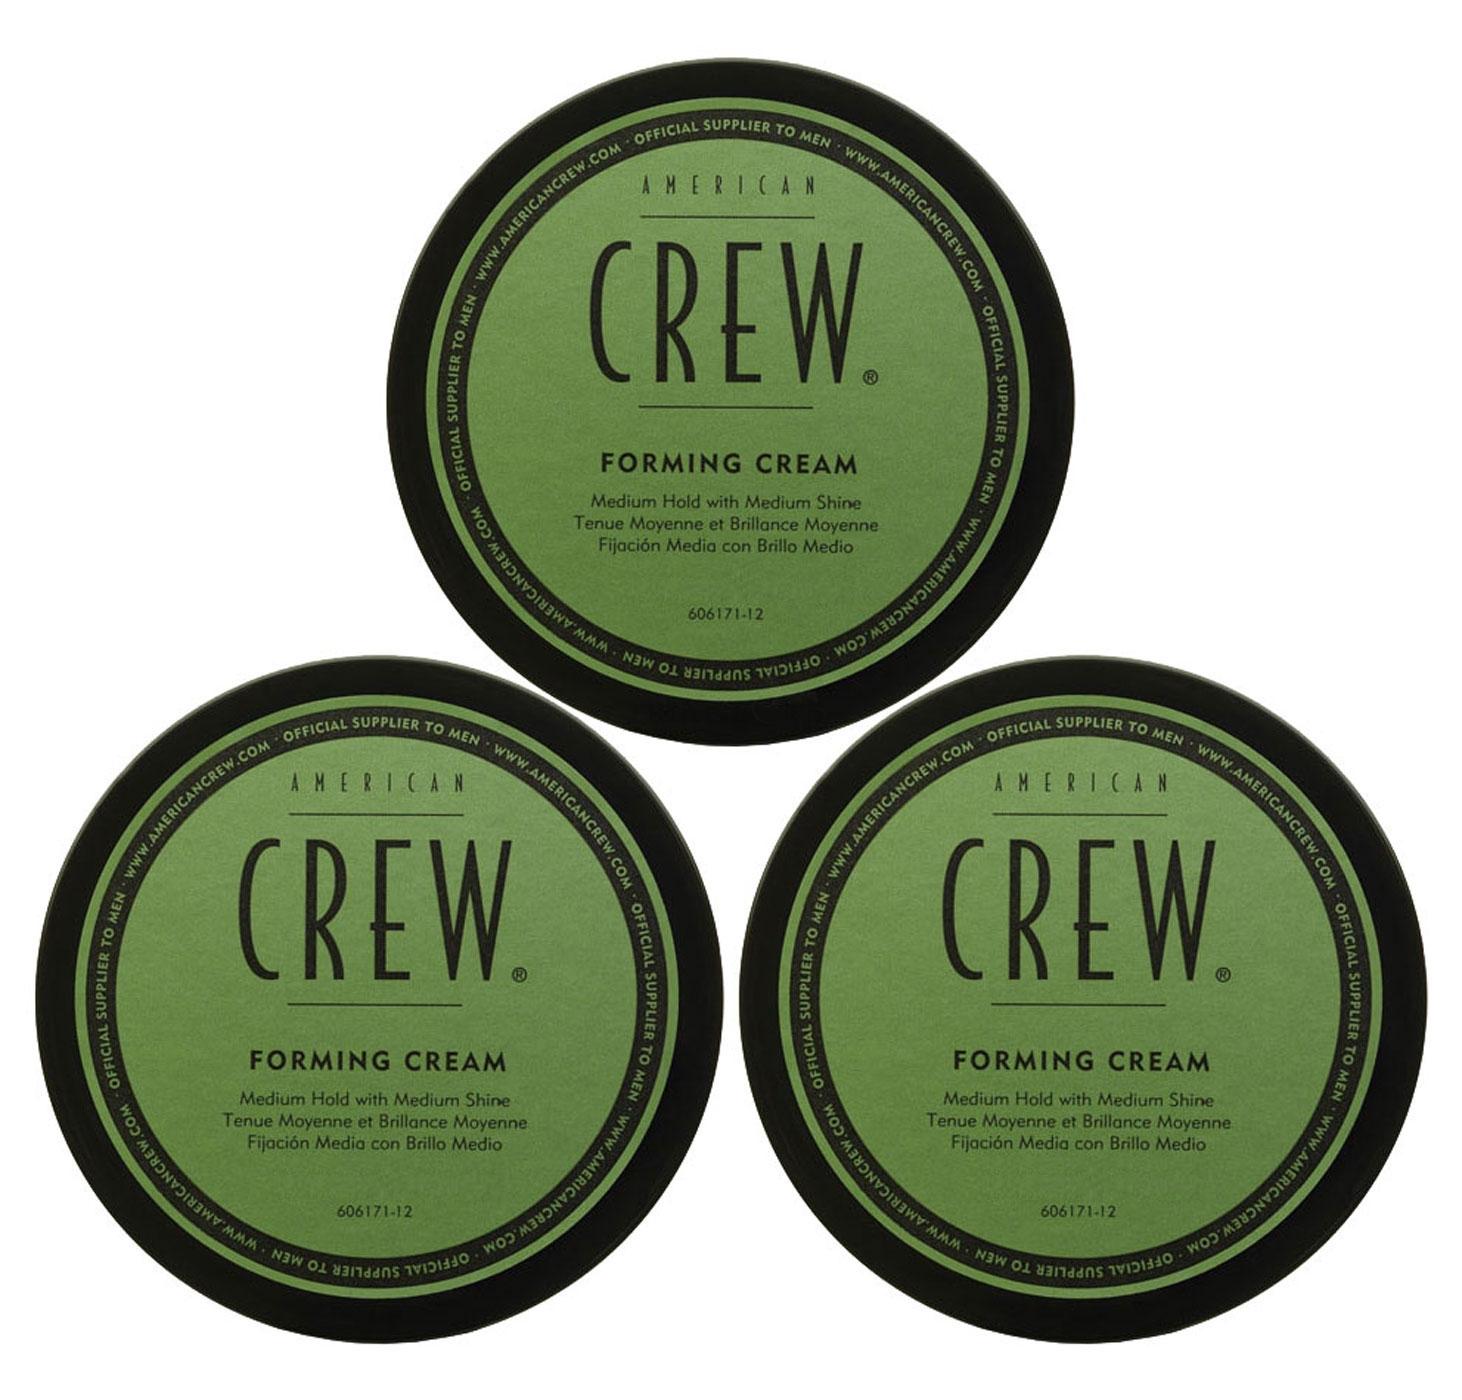 American Crew Forming Cream Aktion - 3x 50g = 150g